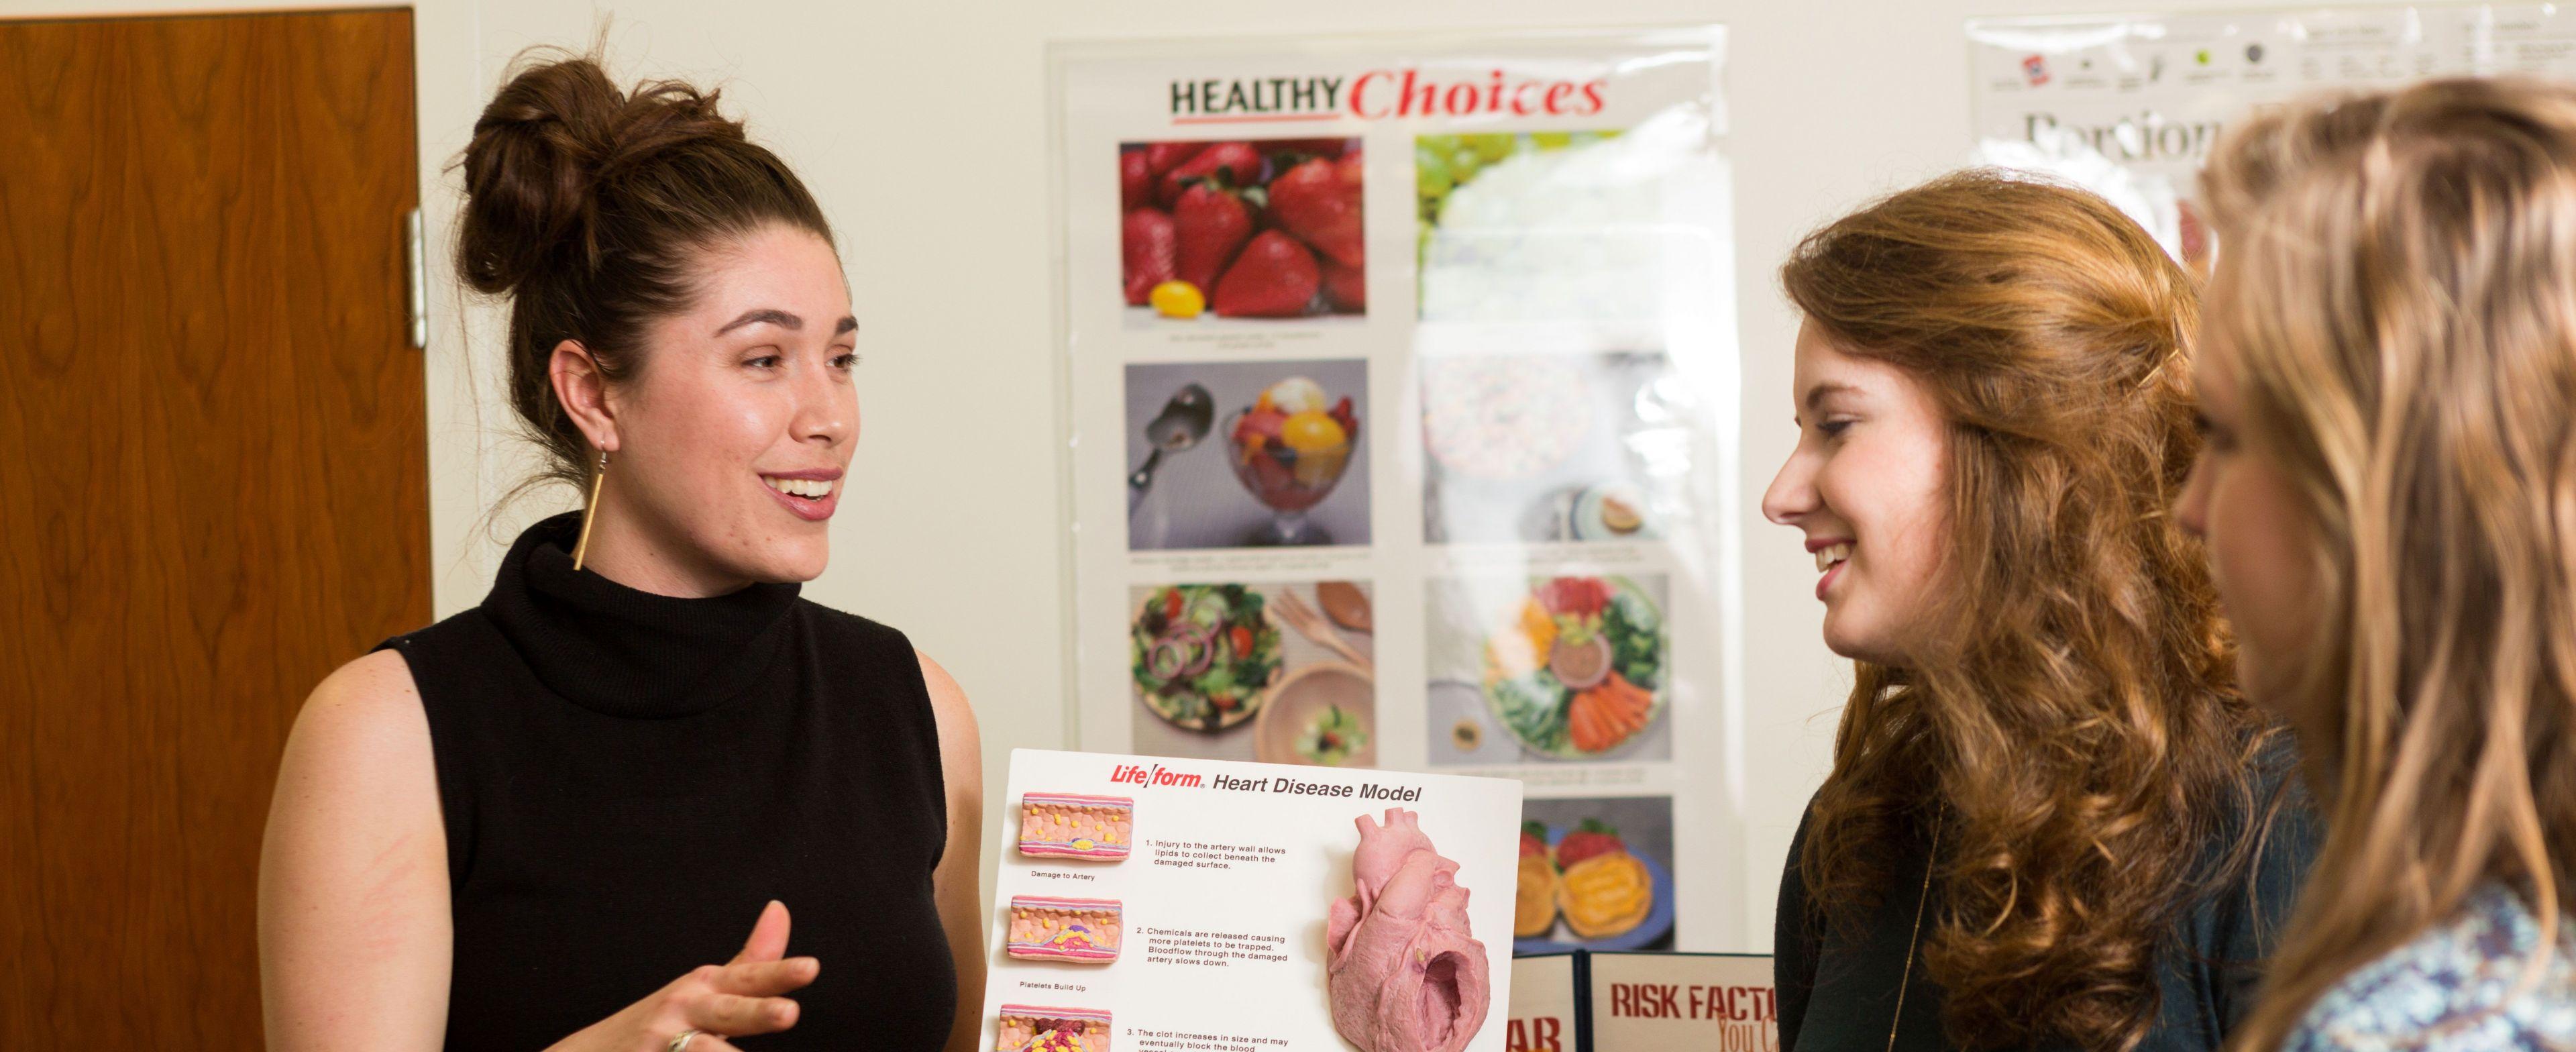 Bachelors Degree In Public Health